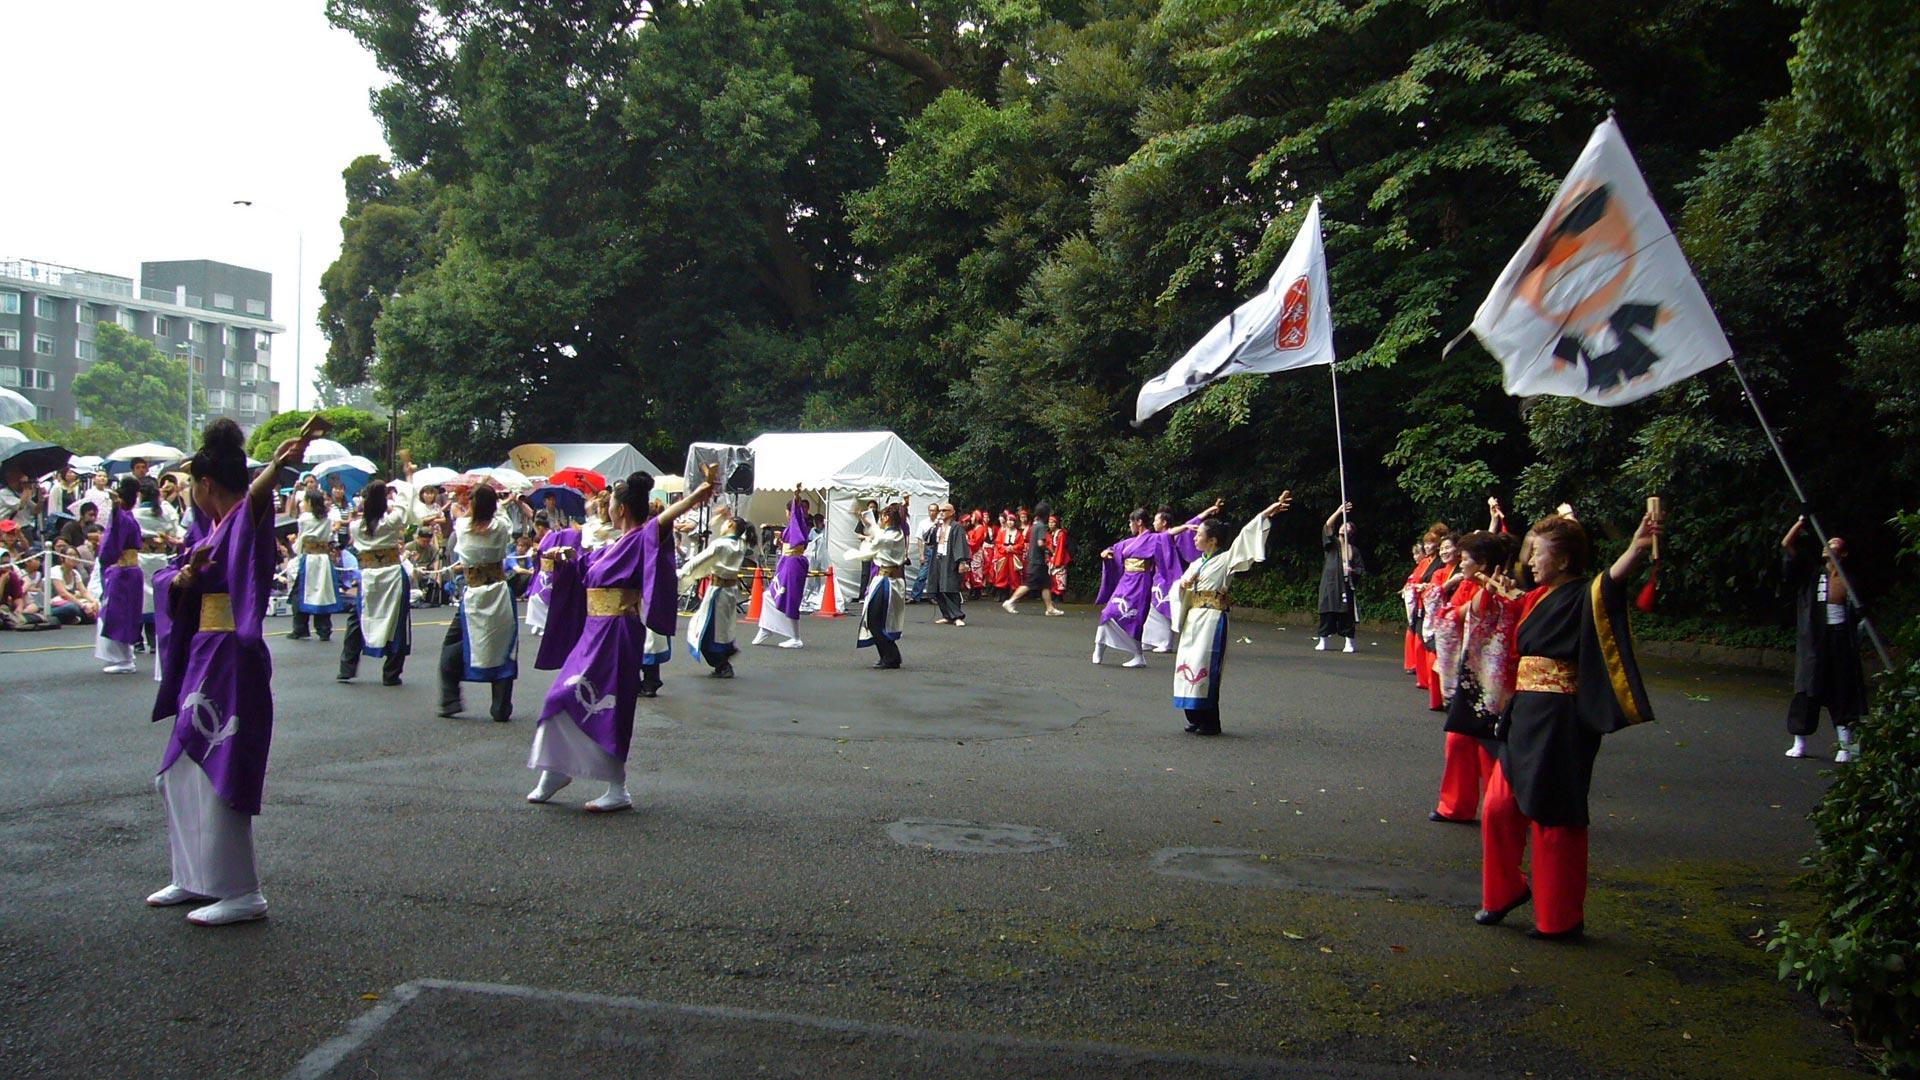 The street performances